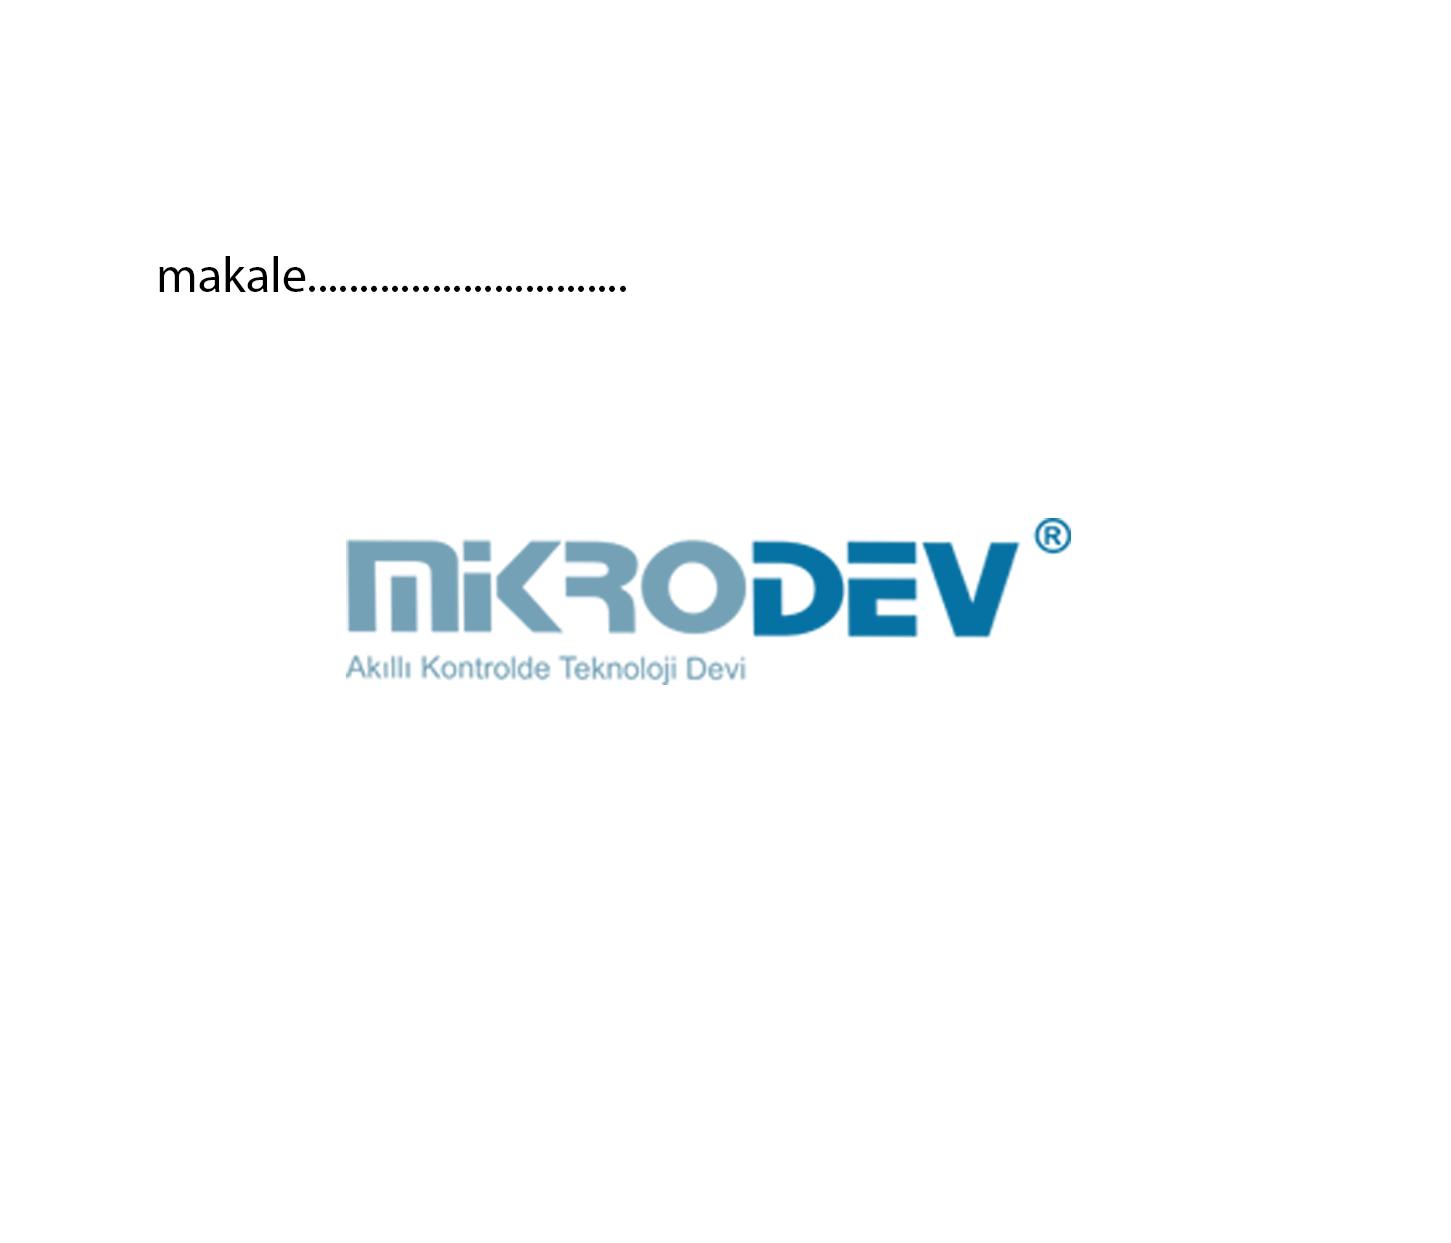 DEV-NET (DEVICE NETWORK) HABERLEŞME PROTOKOLÜ